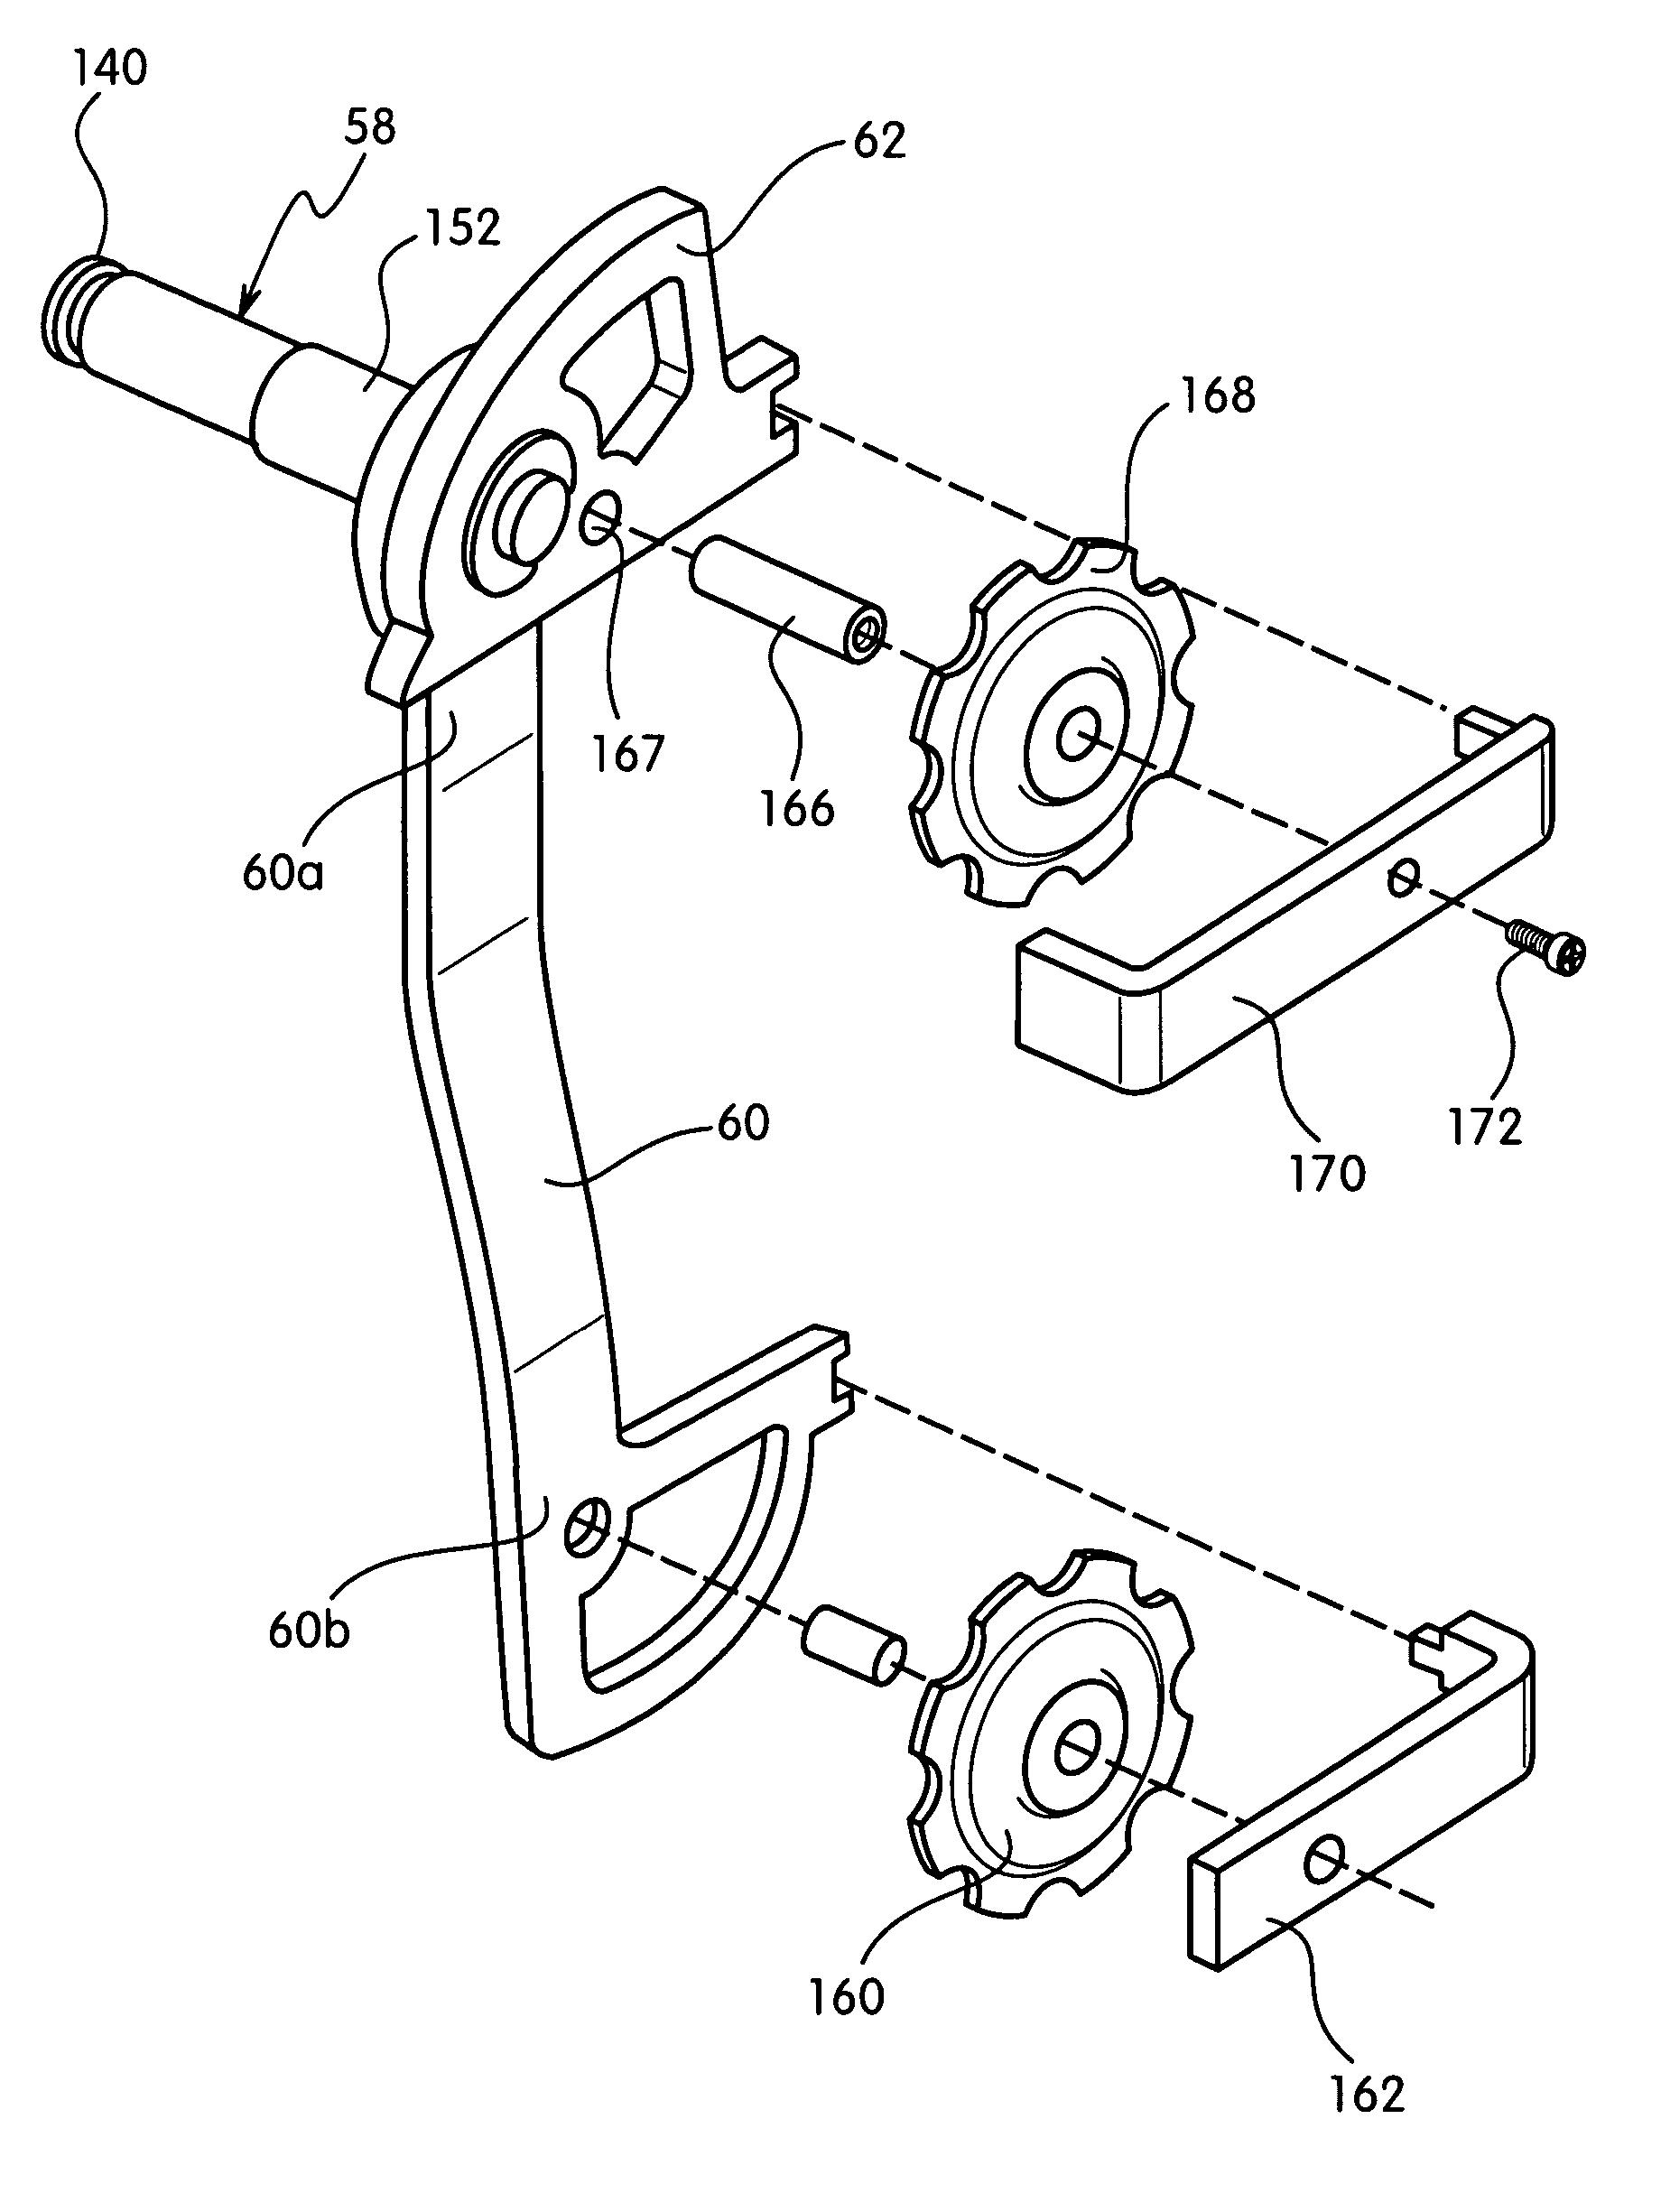 Patent Us7666111 Bicycle Rear Derailleur Google Patenti Diagram Drawing